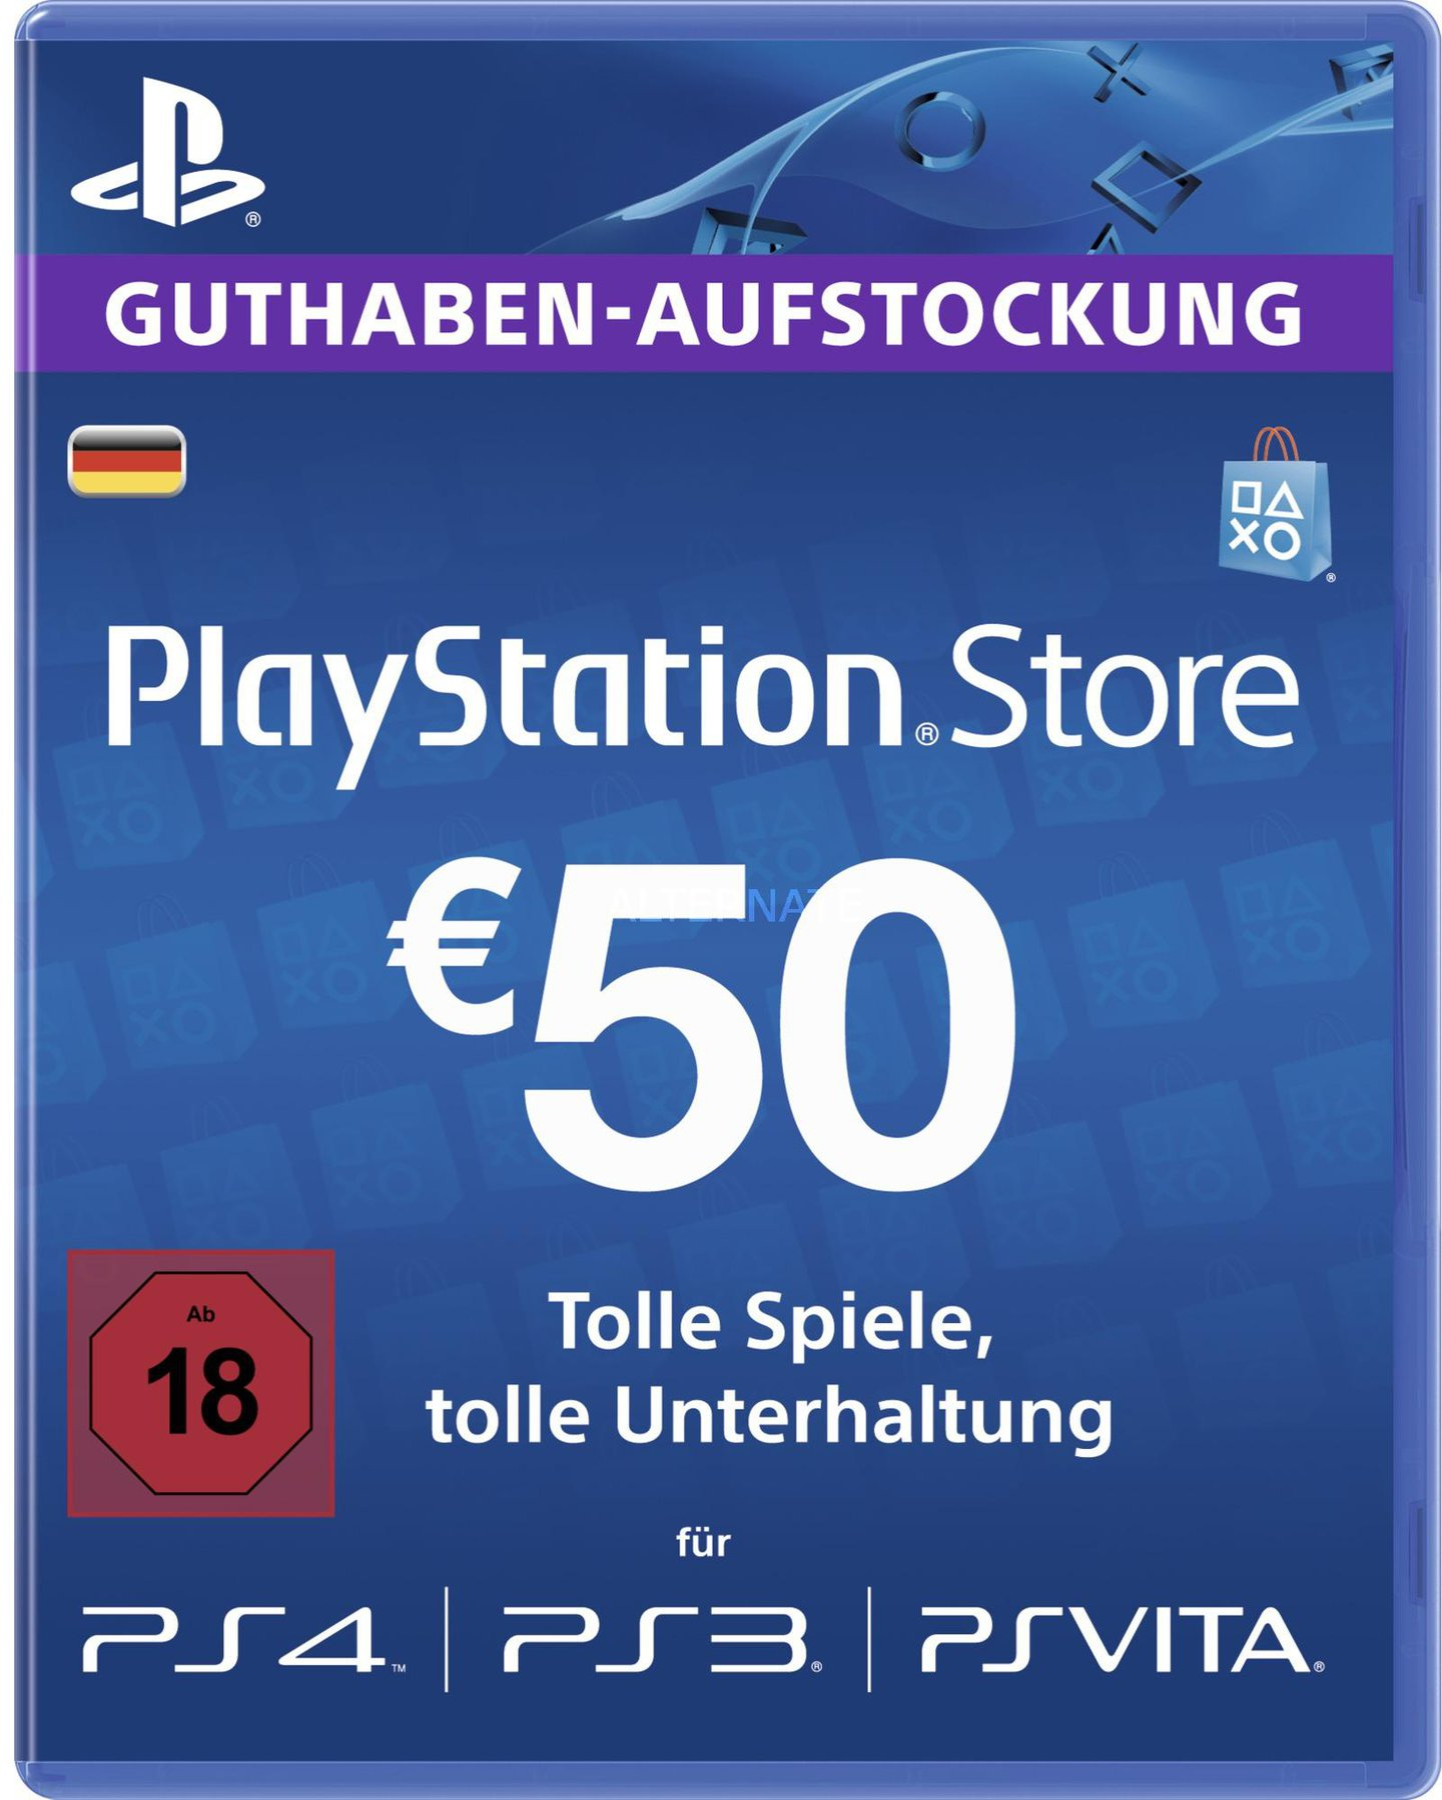 Playstation Karte Aufladen.Sony Playstation Network Card 50 De